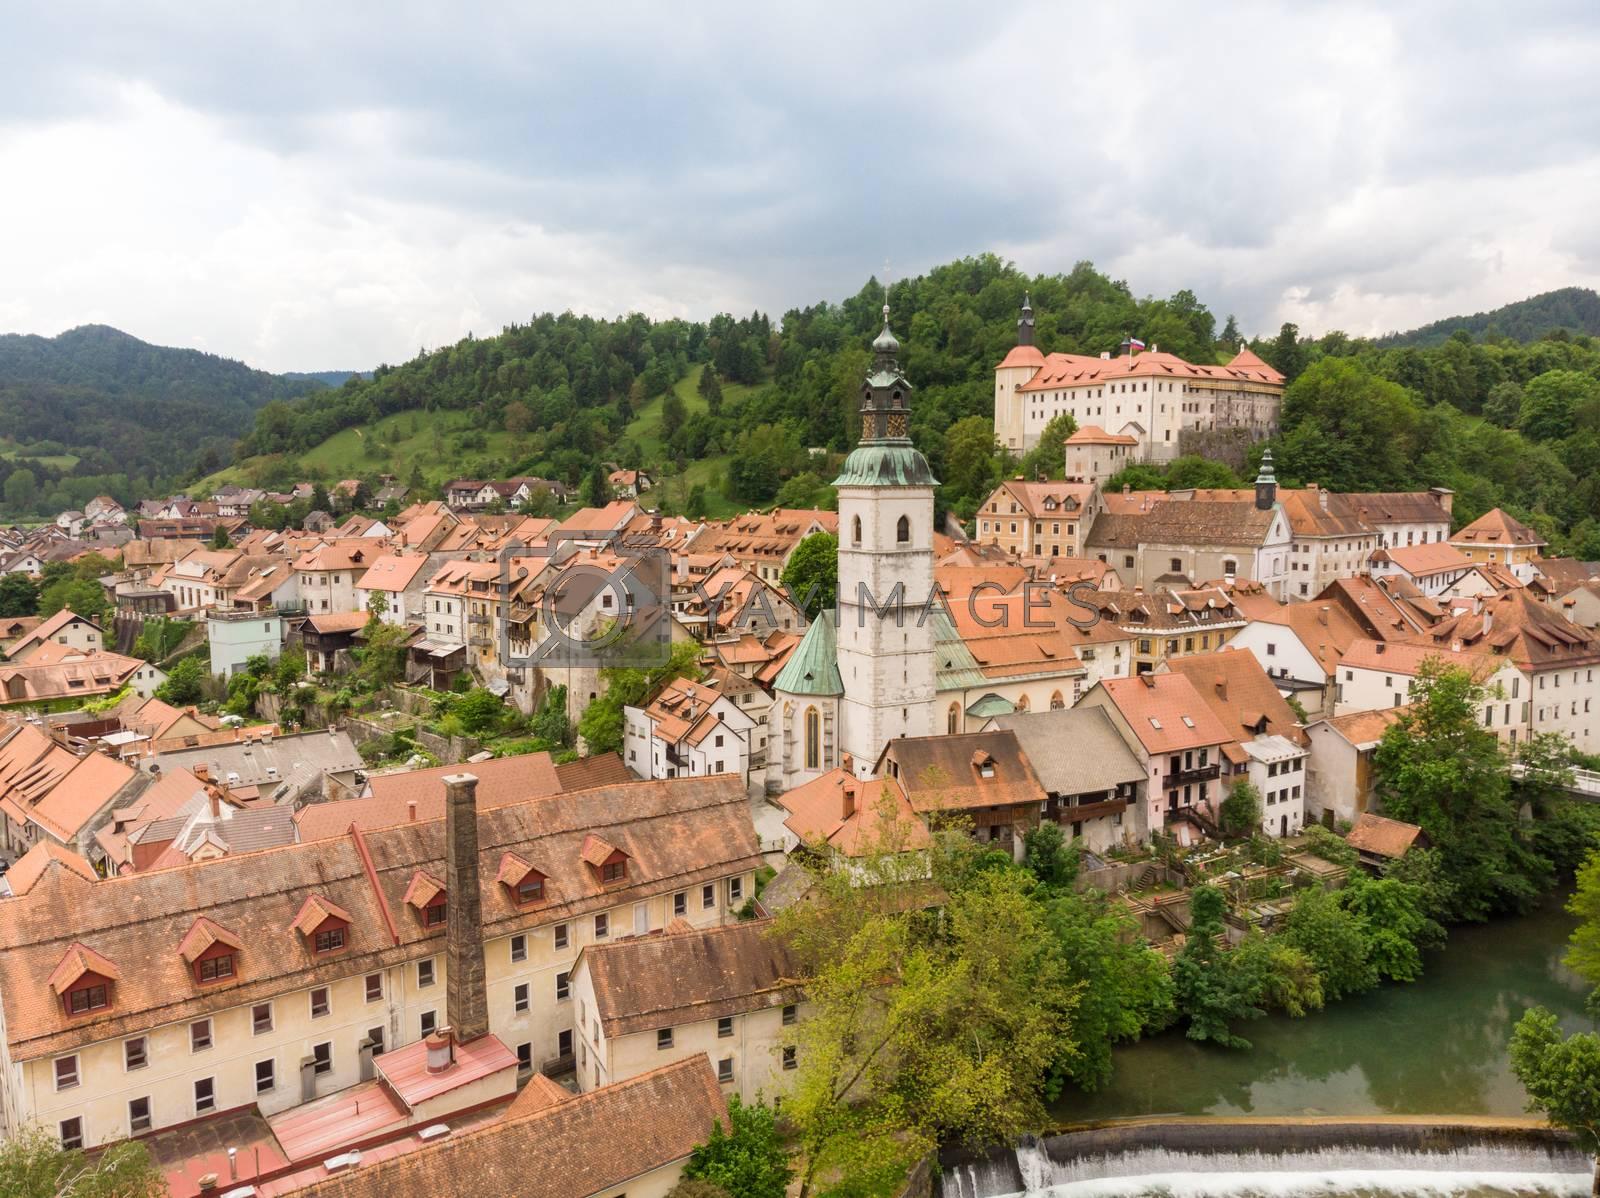 Panoramic aerial view of medieval old town of Skofja Loka, Slovenia.